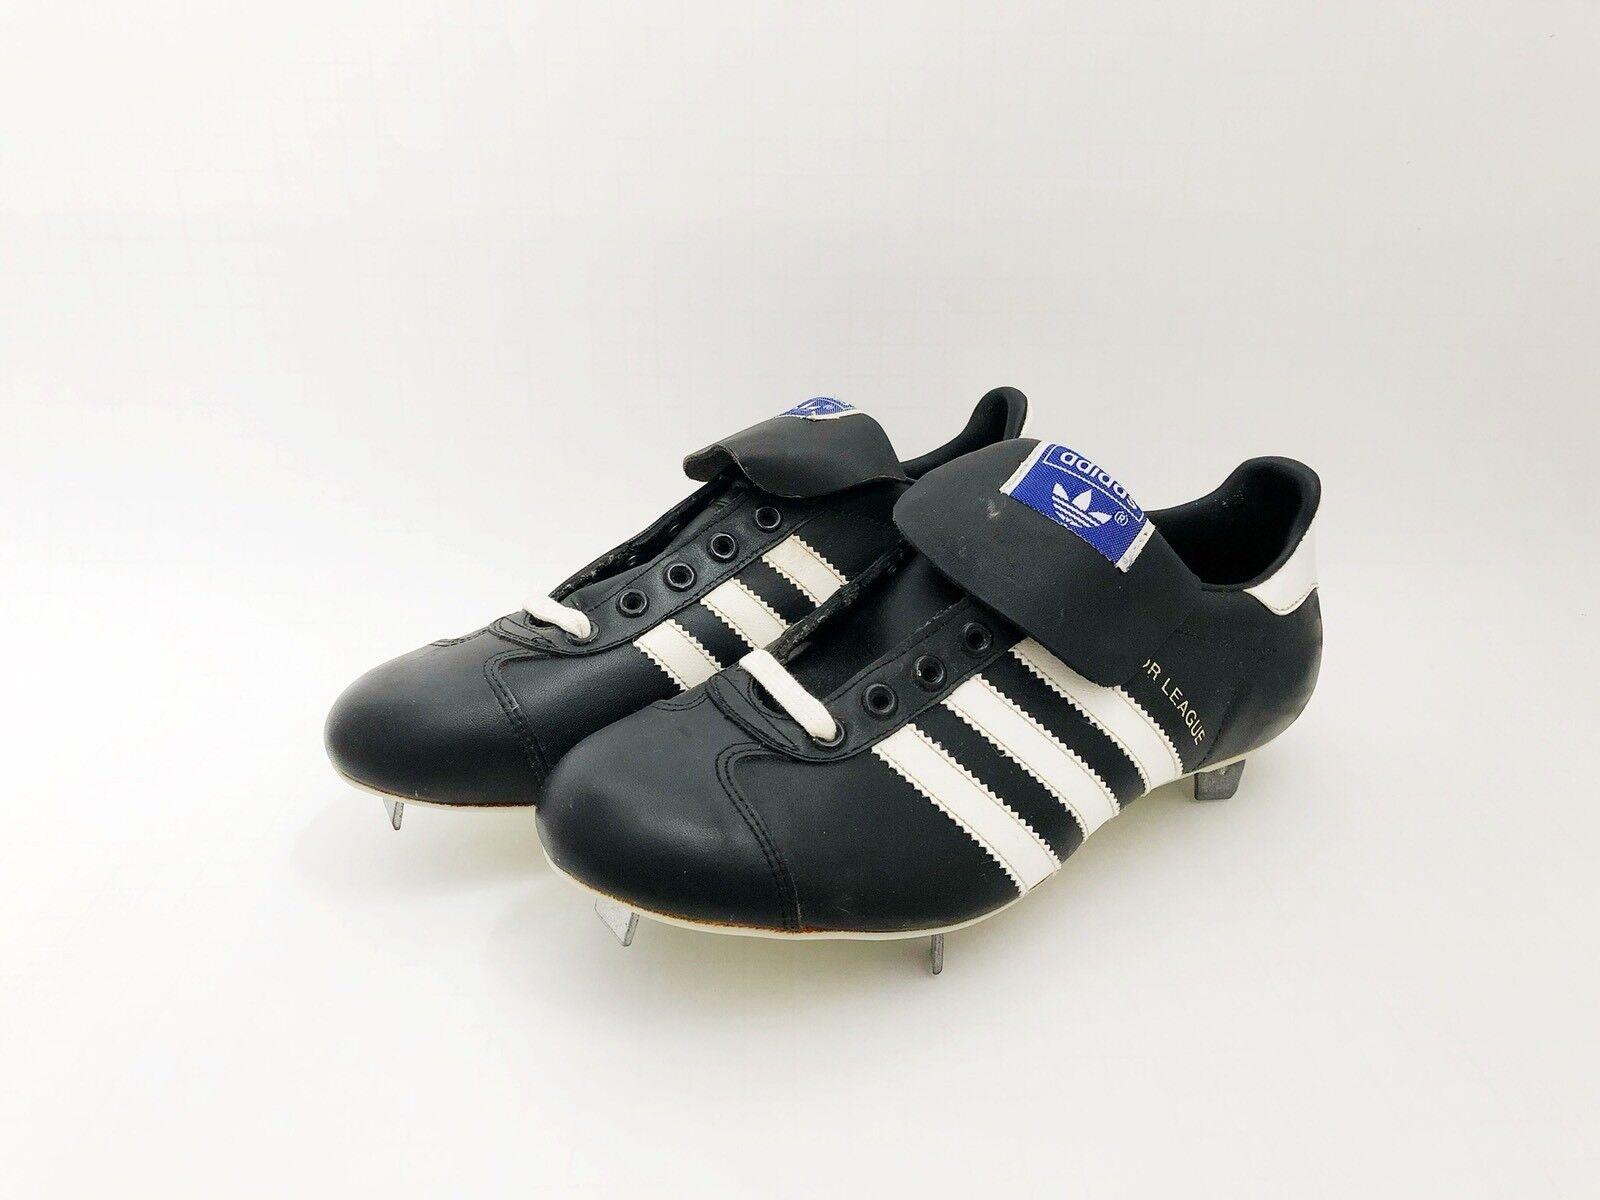 Vintage adidas major league spikes shoes Uomo size 7 deadstock NIB 70s